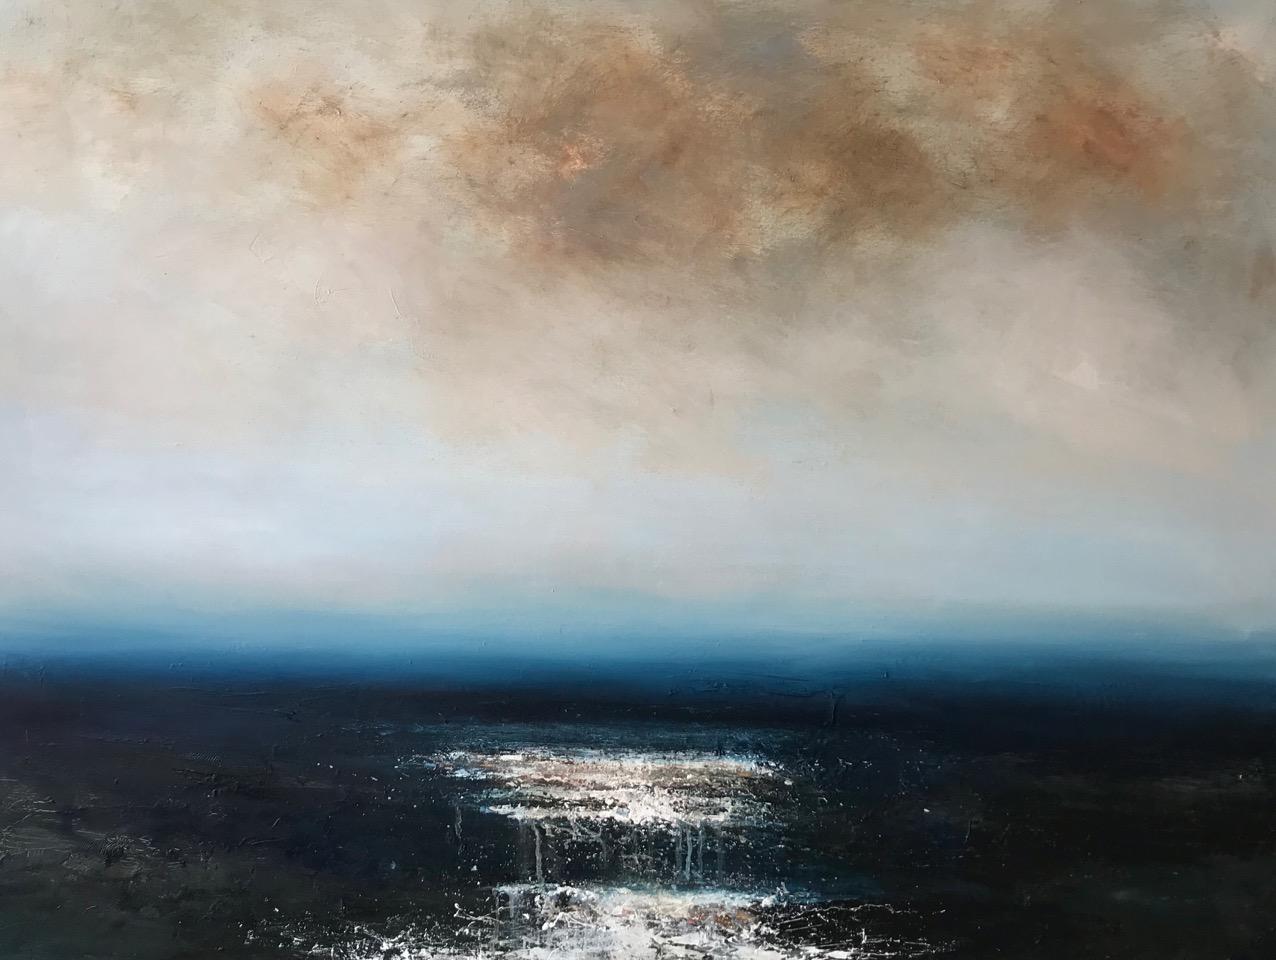 Title: Embark Size: 90 x 120 cm Medium: Oil on canvas